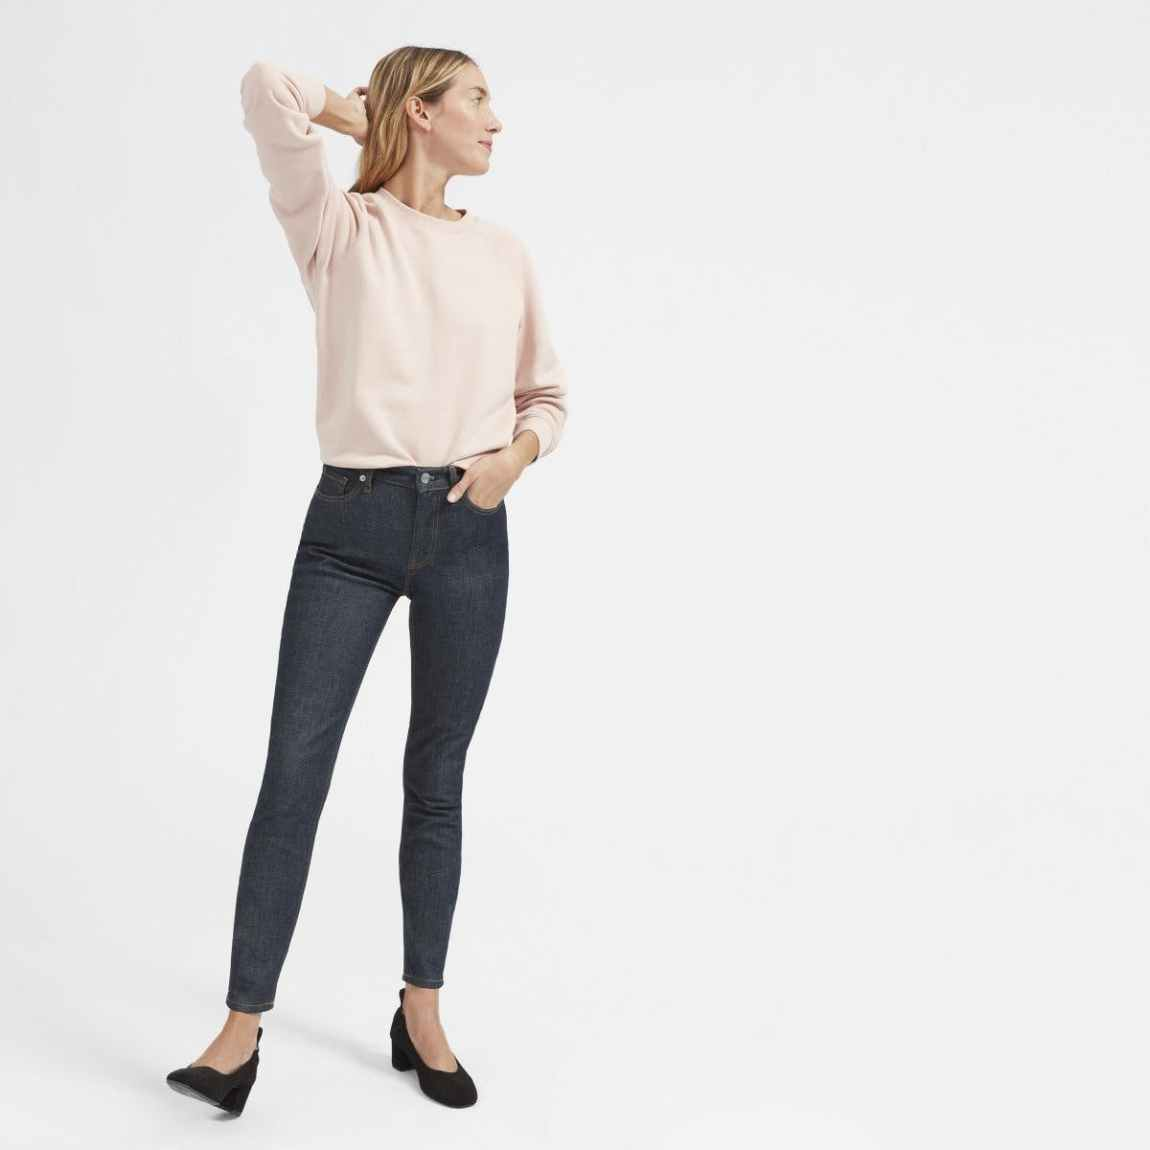 everlane, everlane jeans, everlane denim, japanese denim, raw denim, blue denim, cropped jeans, high rise jeans, skinny jeans, cropped jeans, denimblog, denim blog